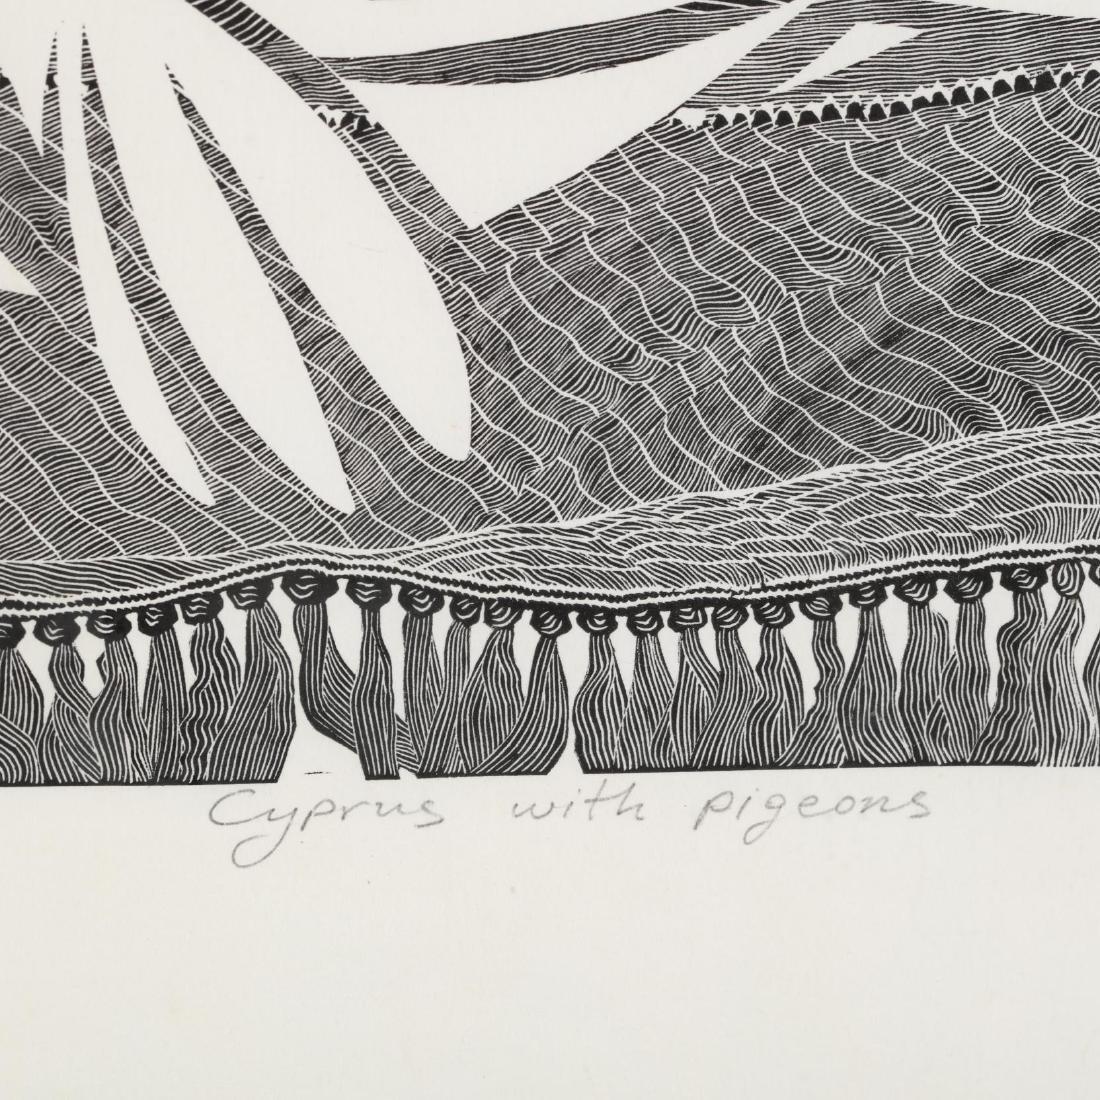 Hambis Tsangaris (Cypriot, b. 1947), Two Visions of - 4